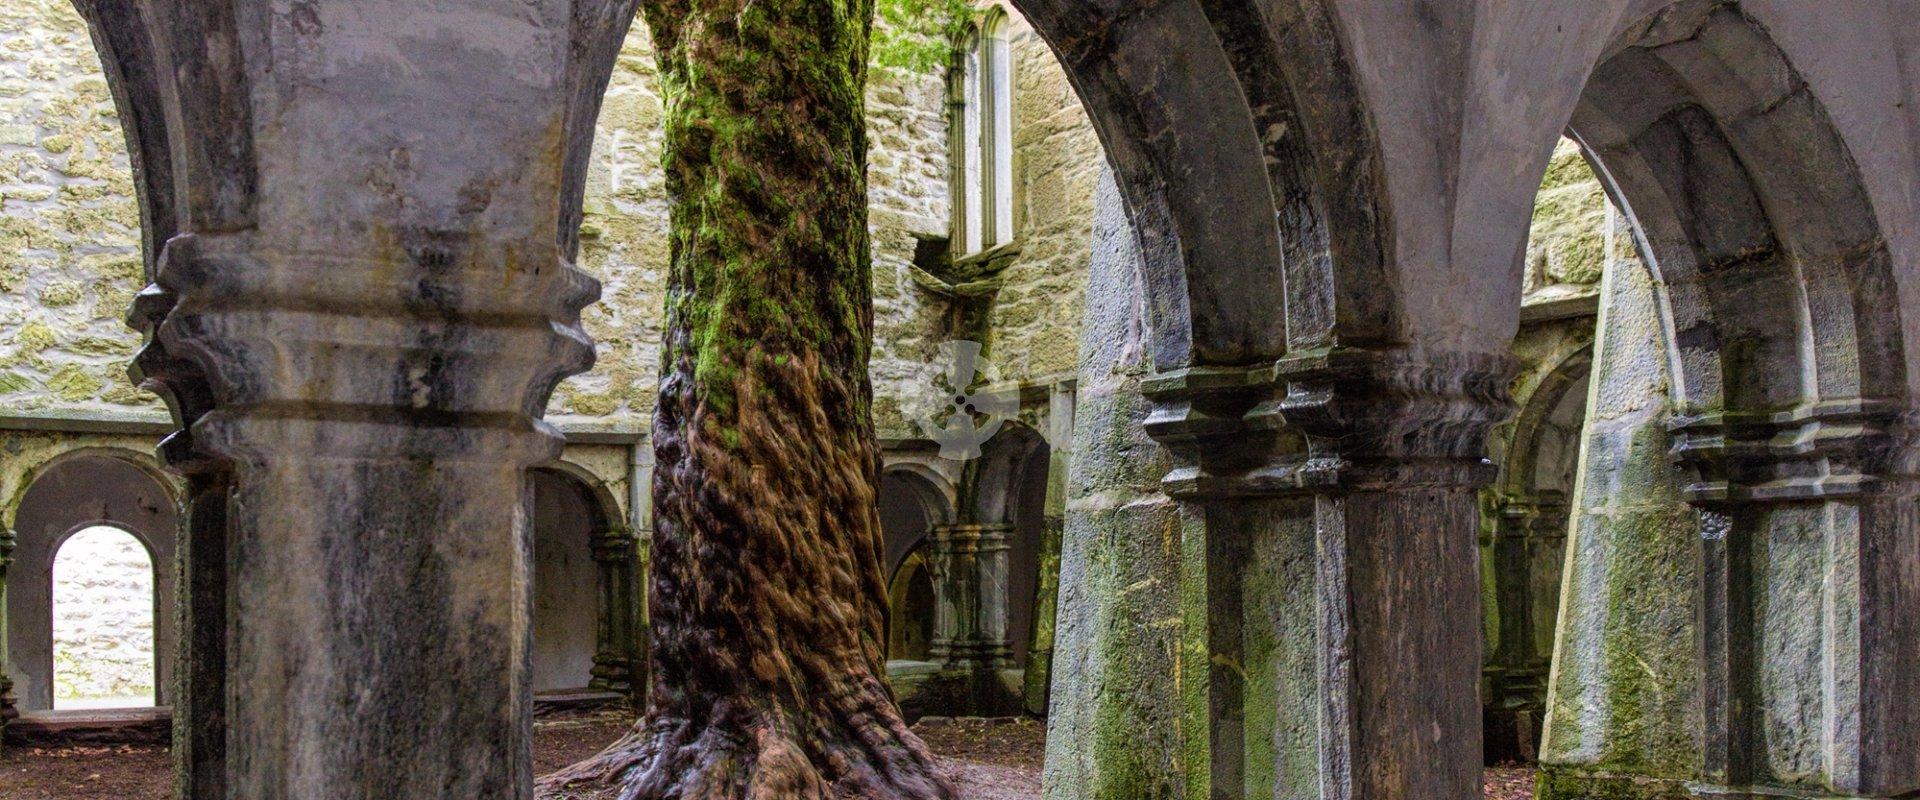 mucross abbey yew tree